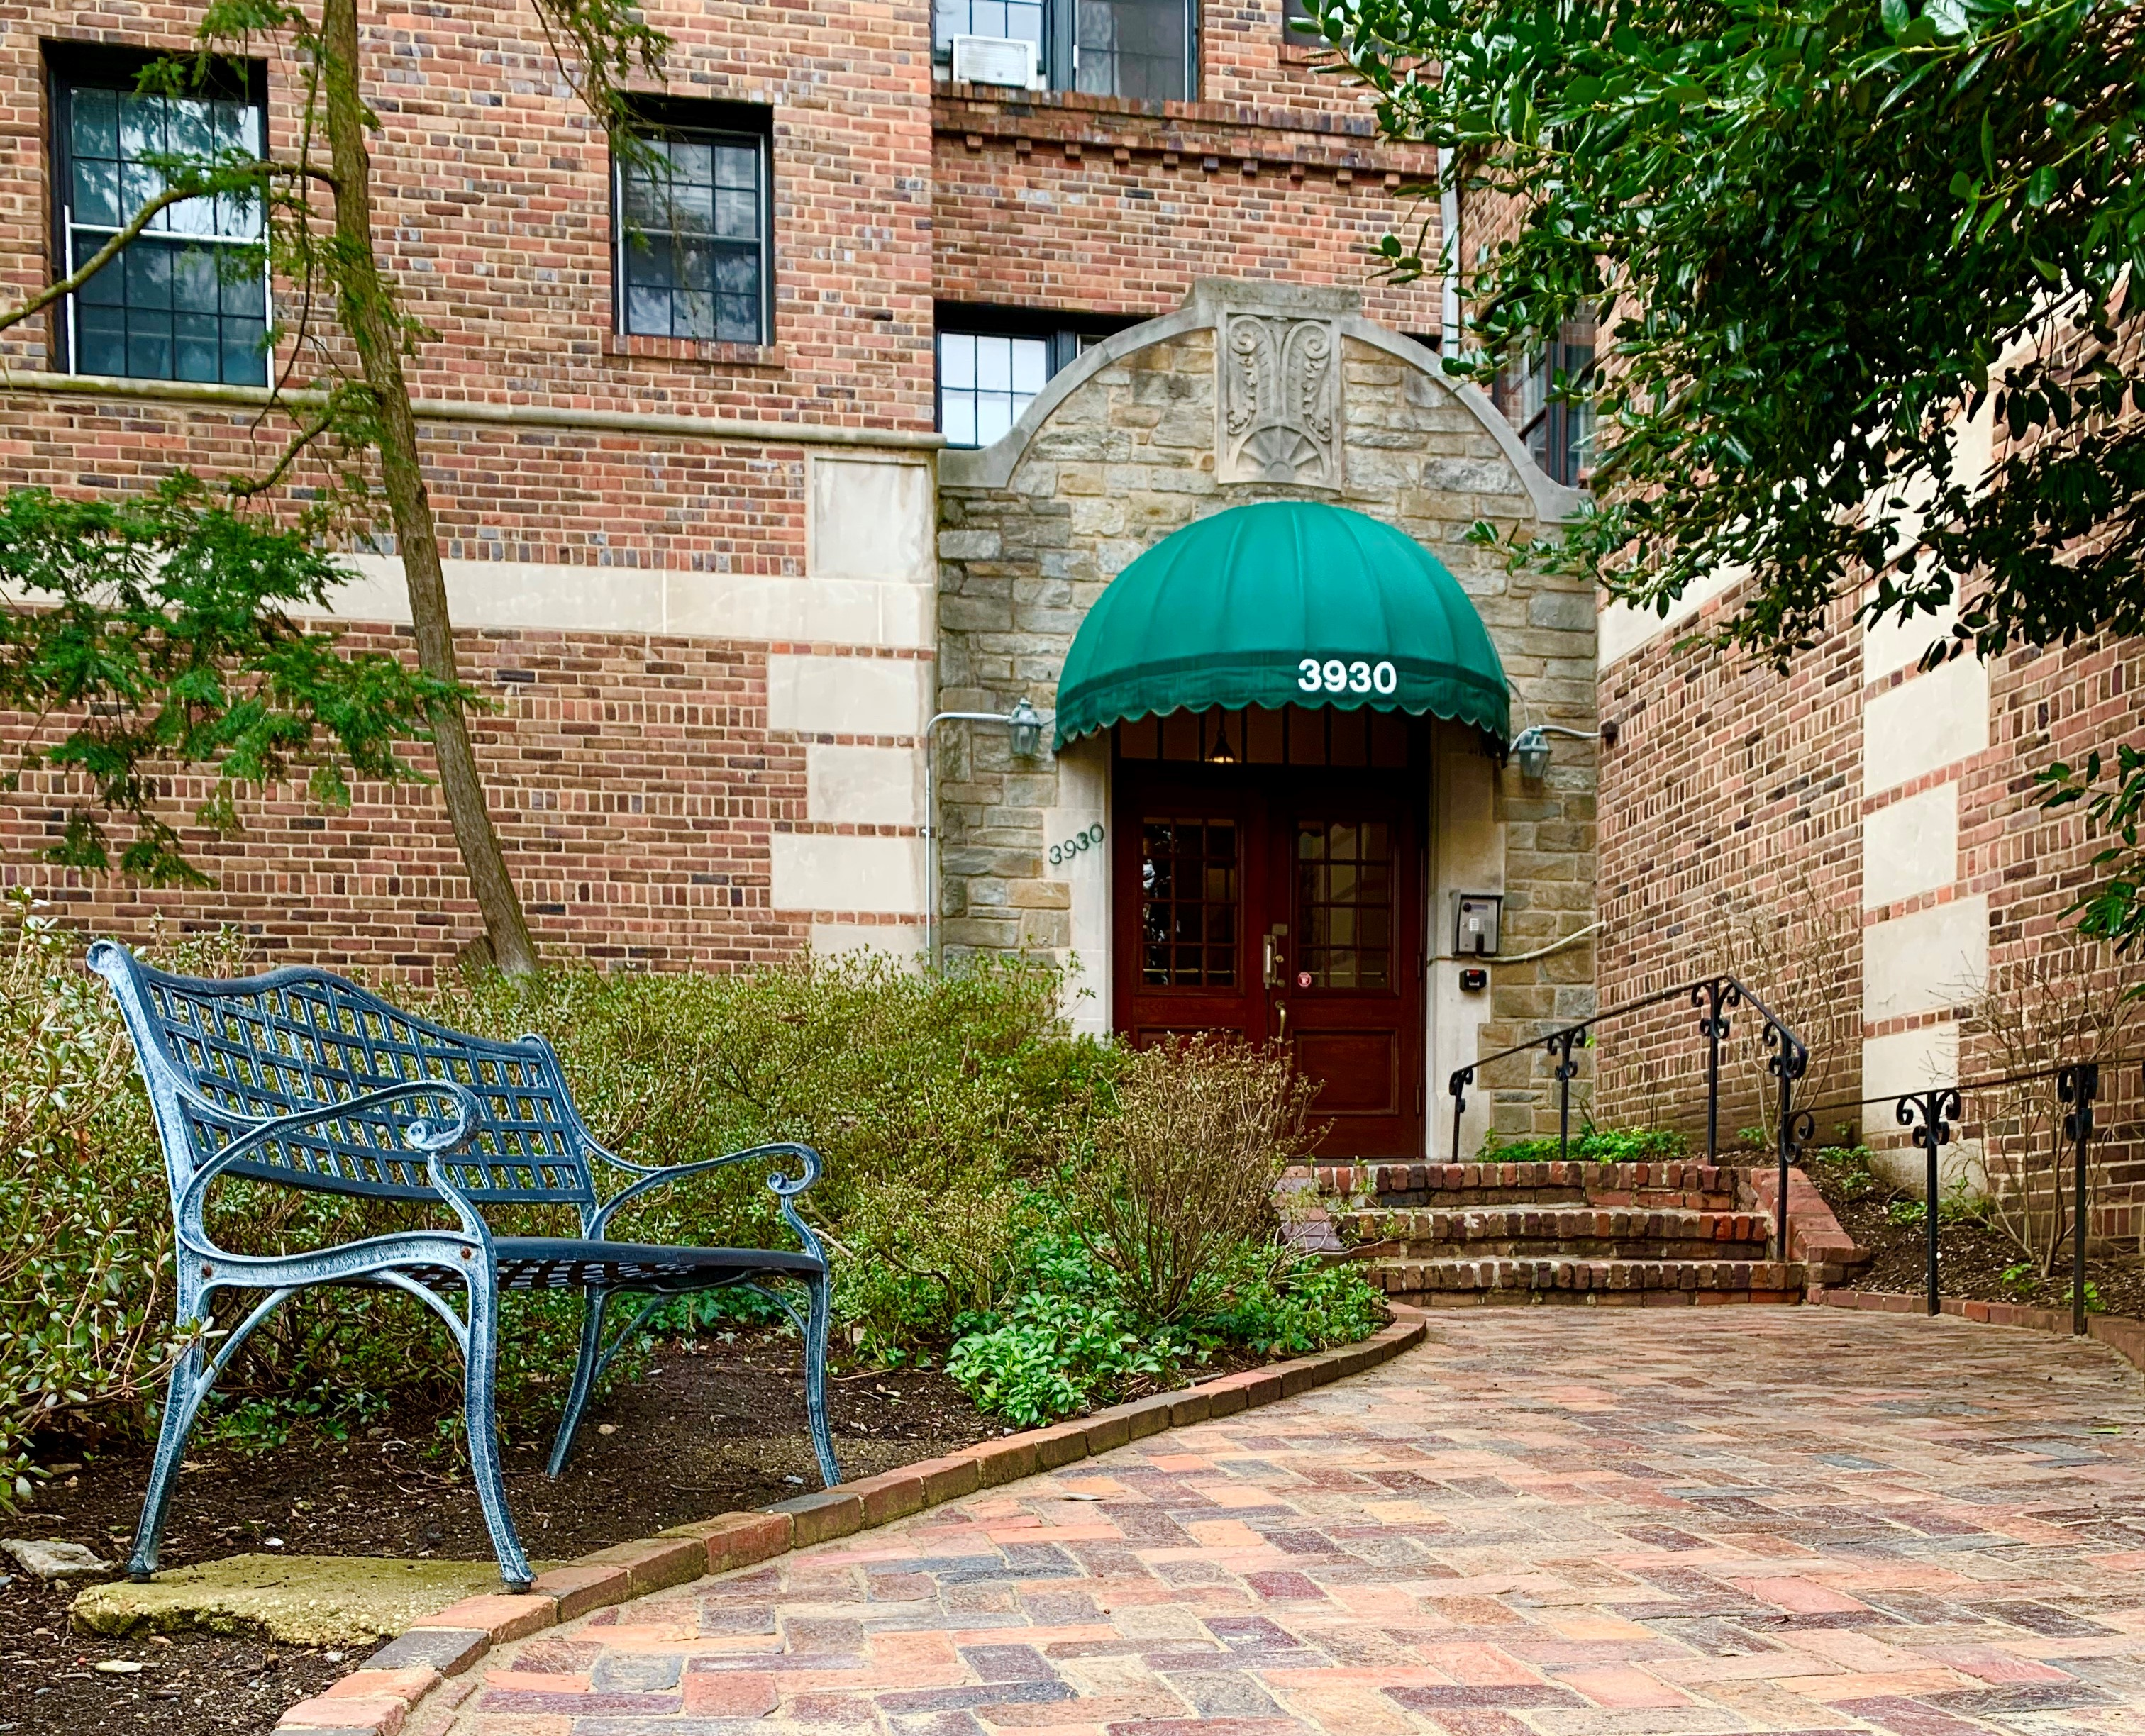 Tilden Gardens Coop. 3930 Sedgewick Street NW. Washington, DC Beaux Arts Style Condos